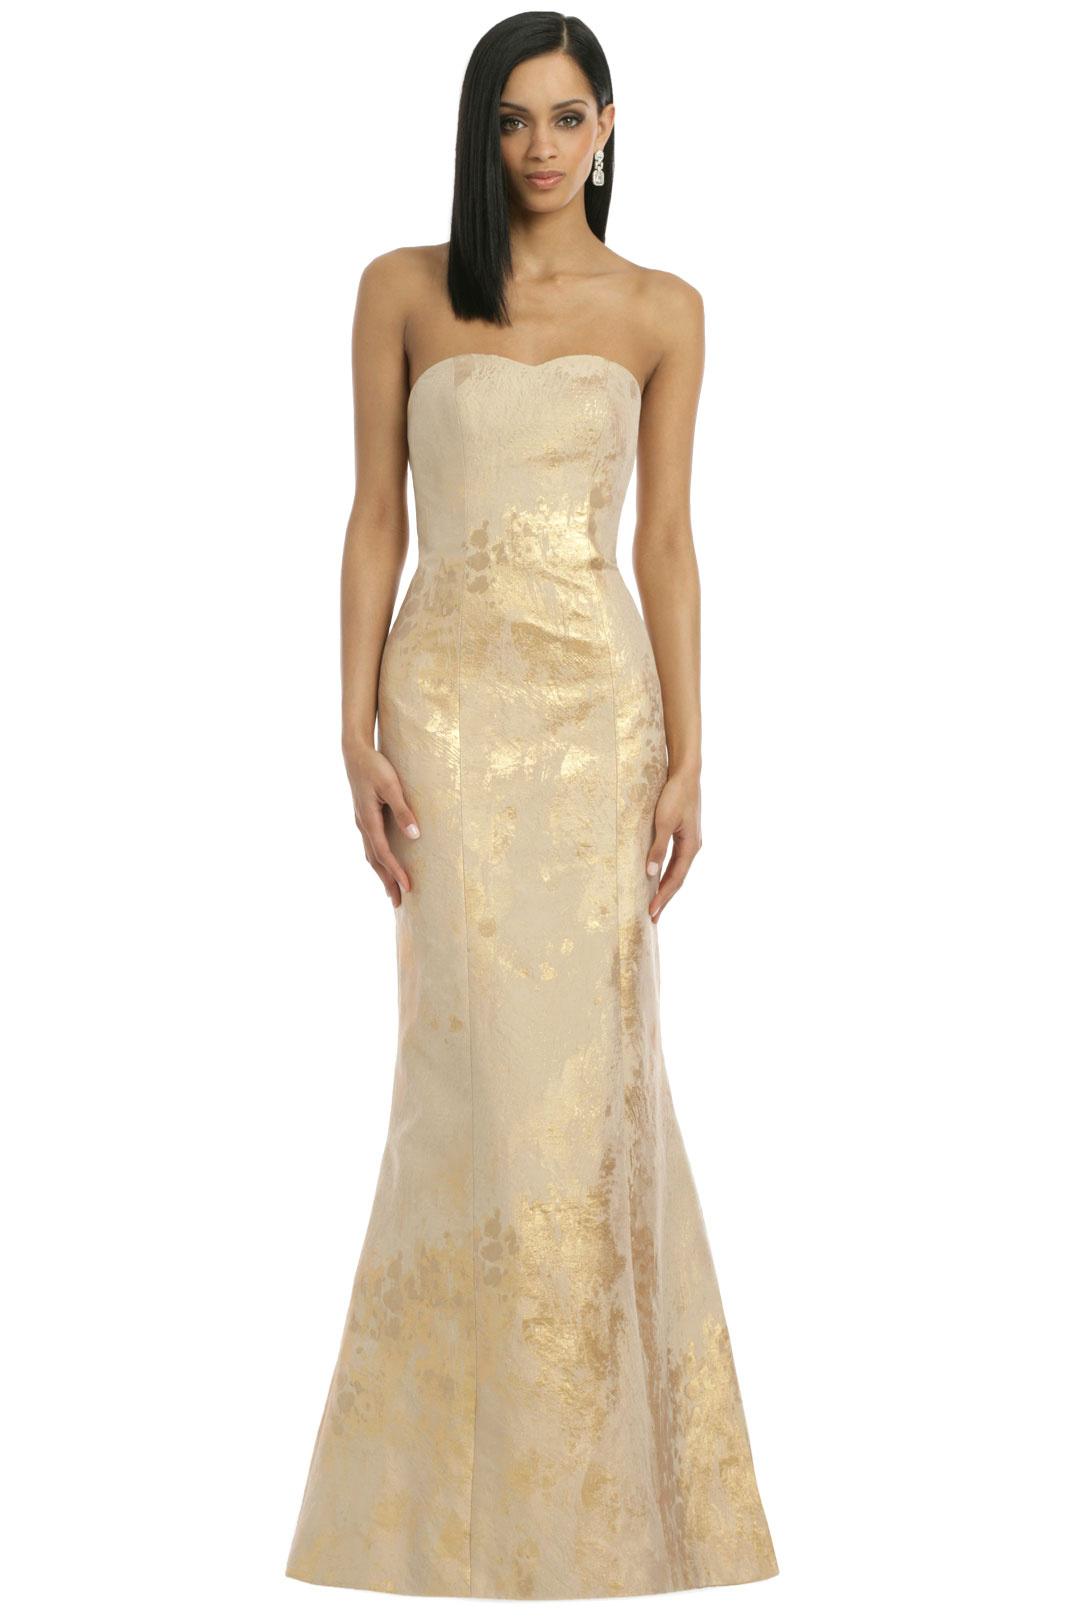 catherine wedding dresses photo - 1